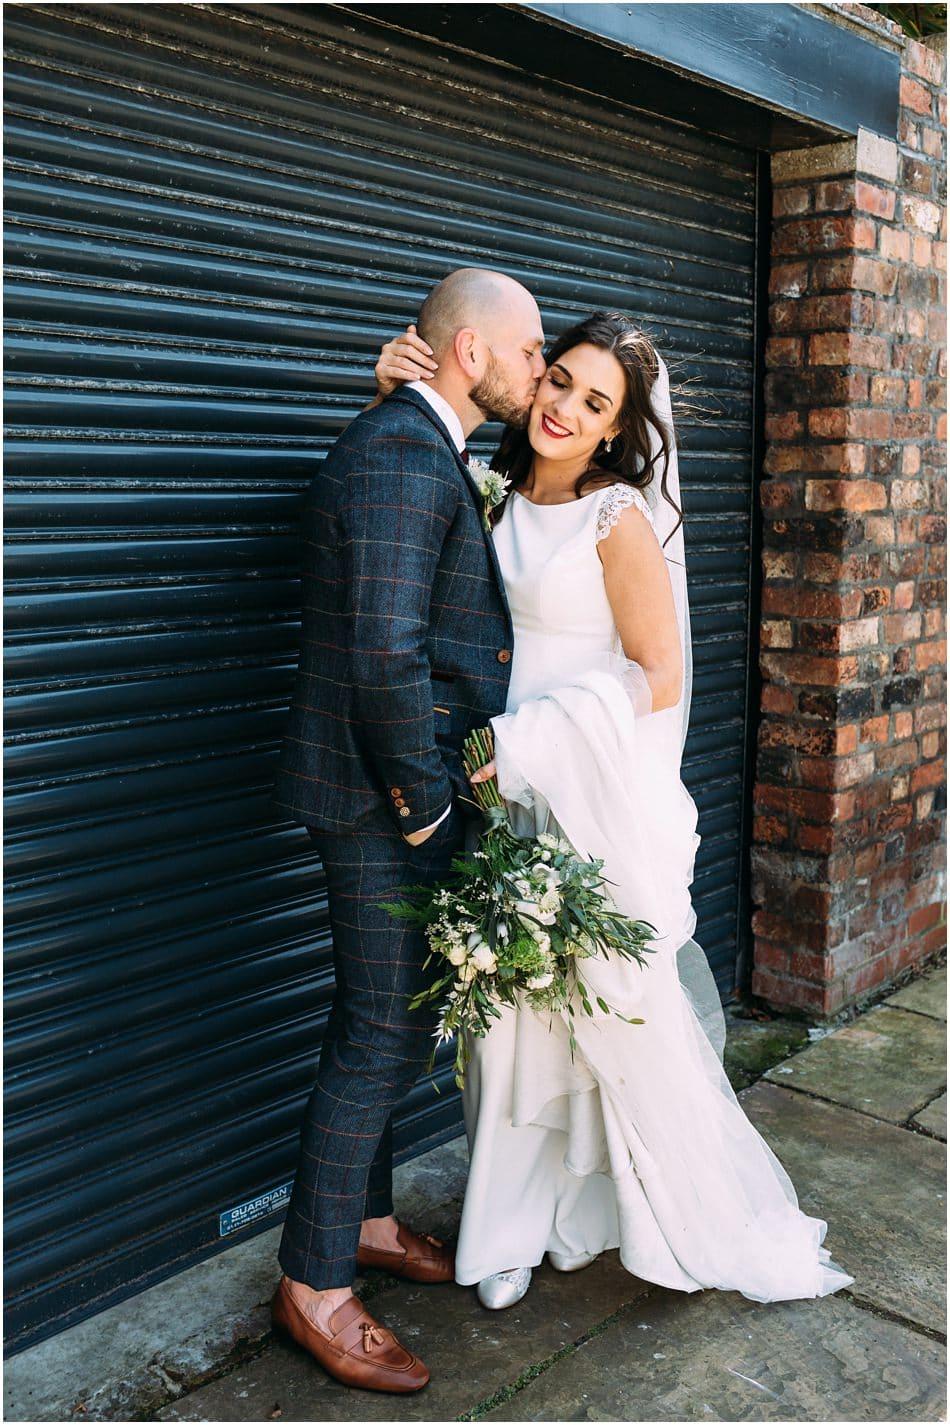 Alternative Hope Street Hotel wedding photography; Bride and Groom kiss